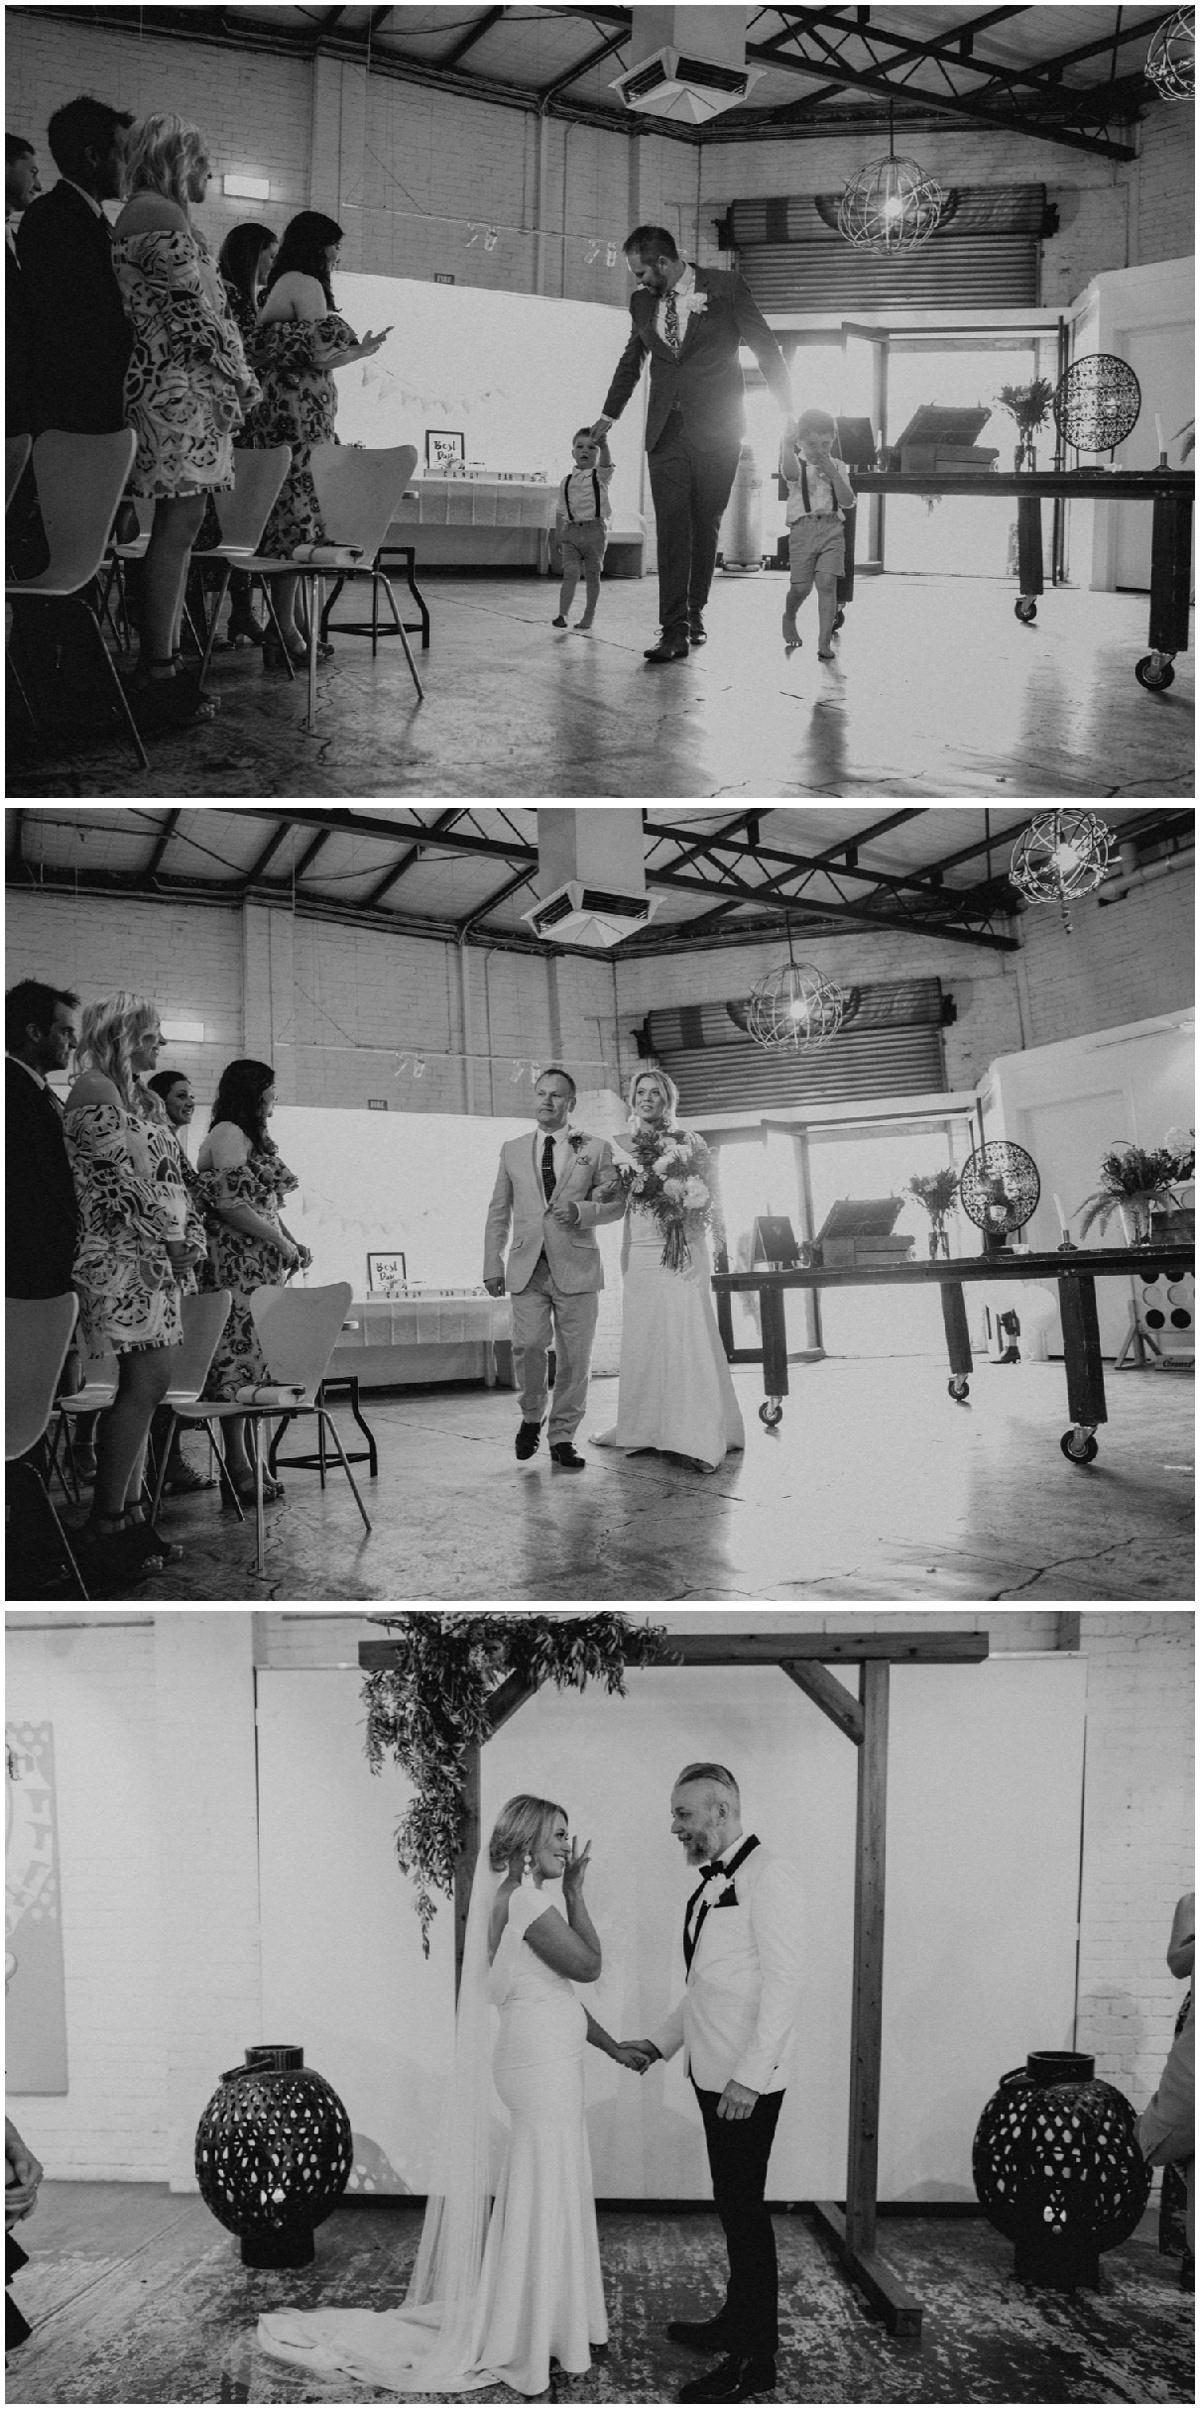 Emily_Tim_Melbourne_Beach_city_wedding_096.jpg